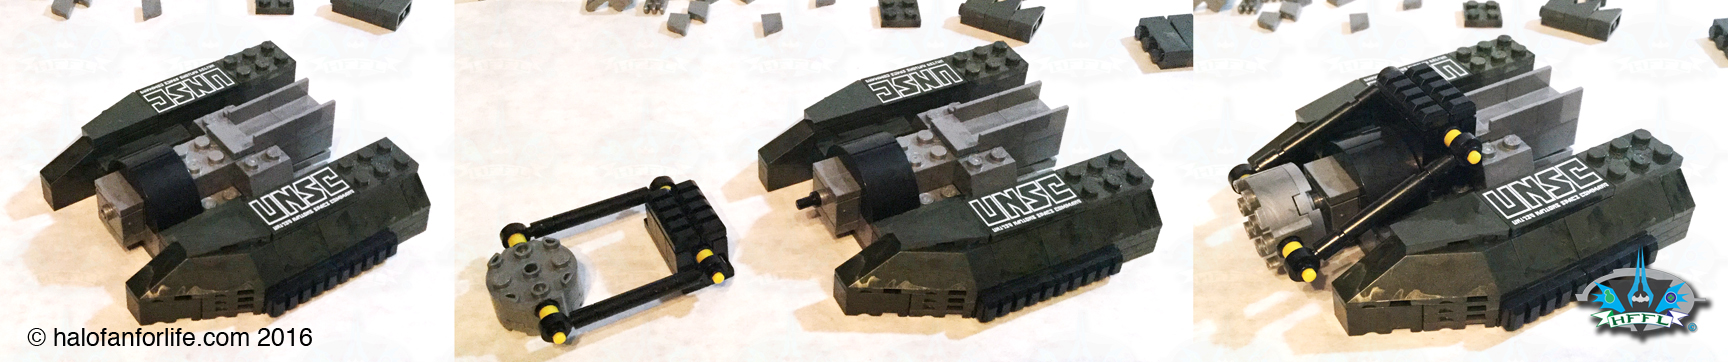 mb-kodiak-steps-5-turret